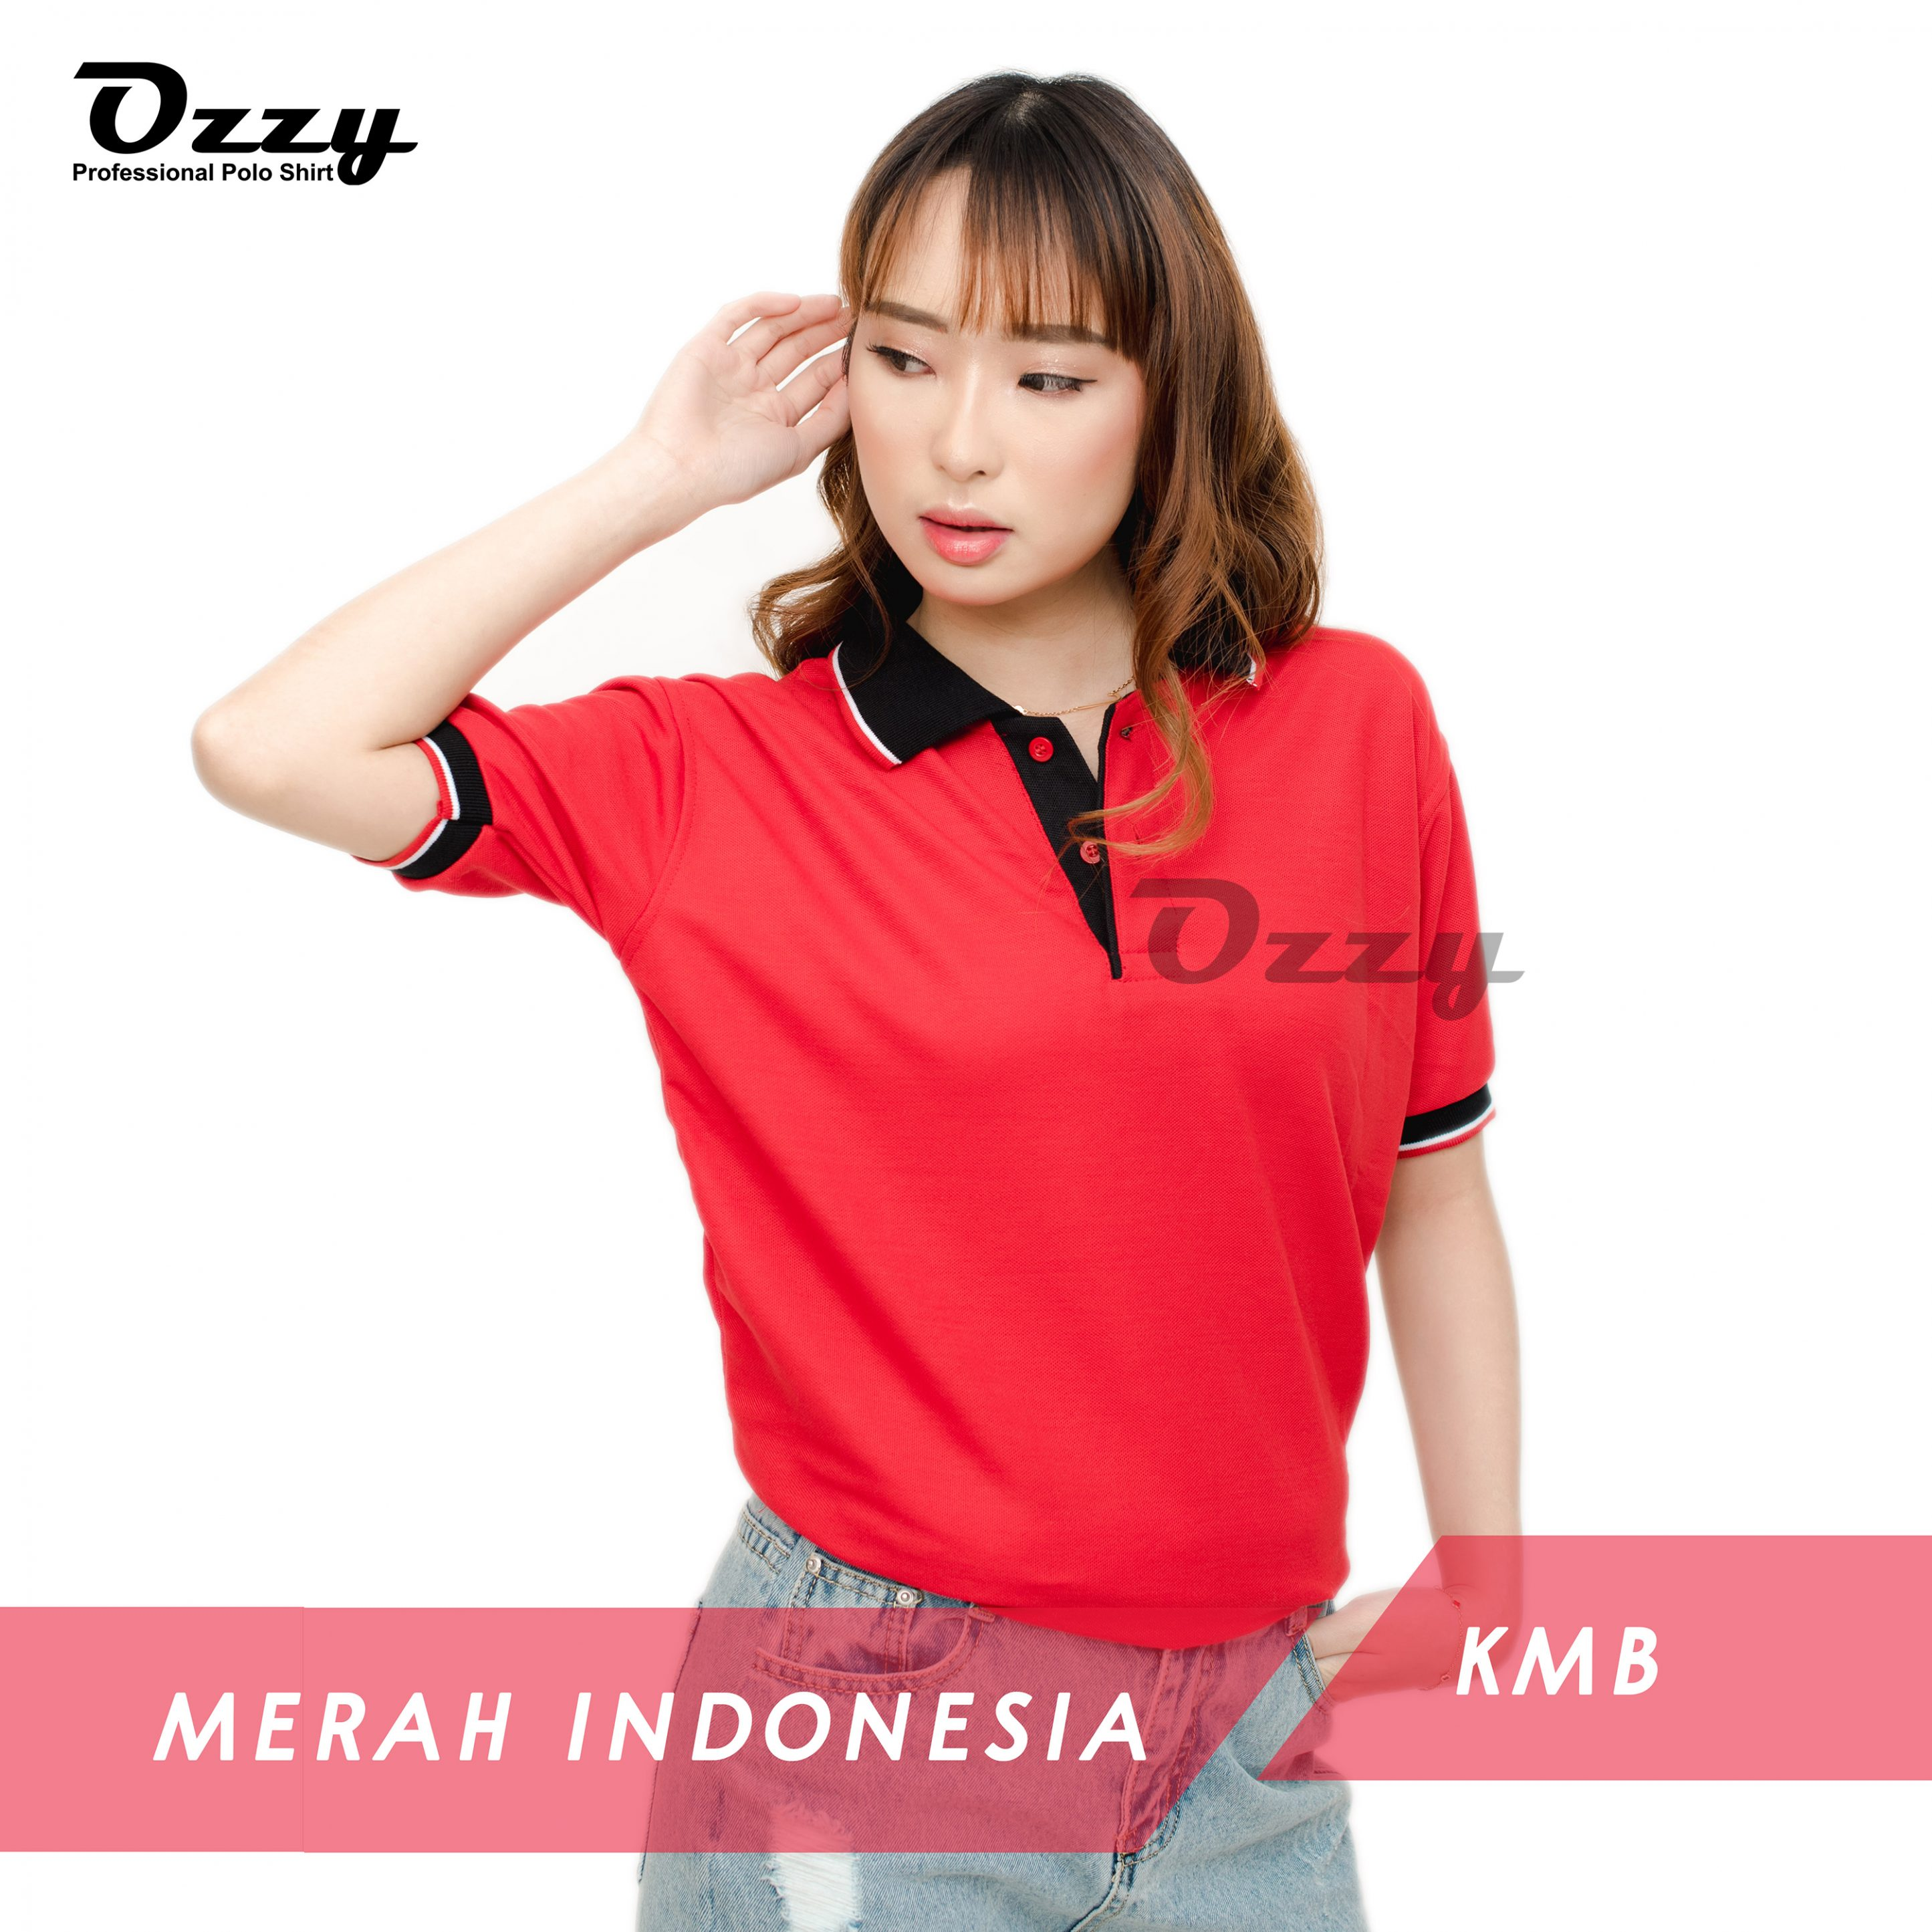 KAOS POLO JOGJA - MERAH INDONESIA KMB (1-2)